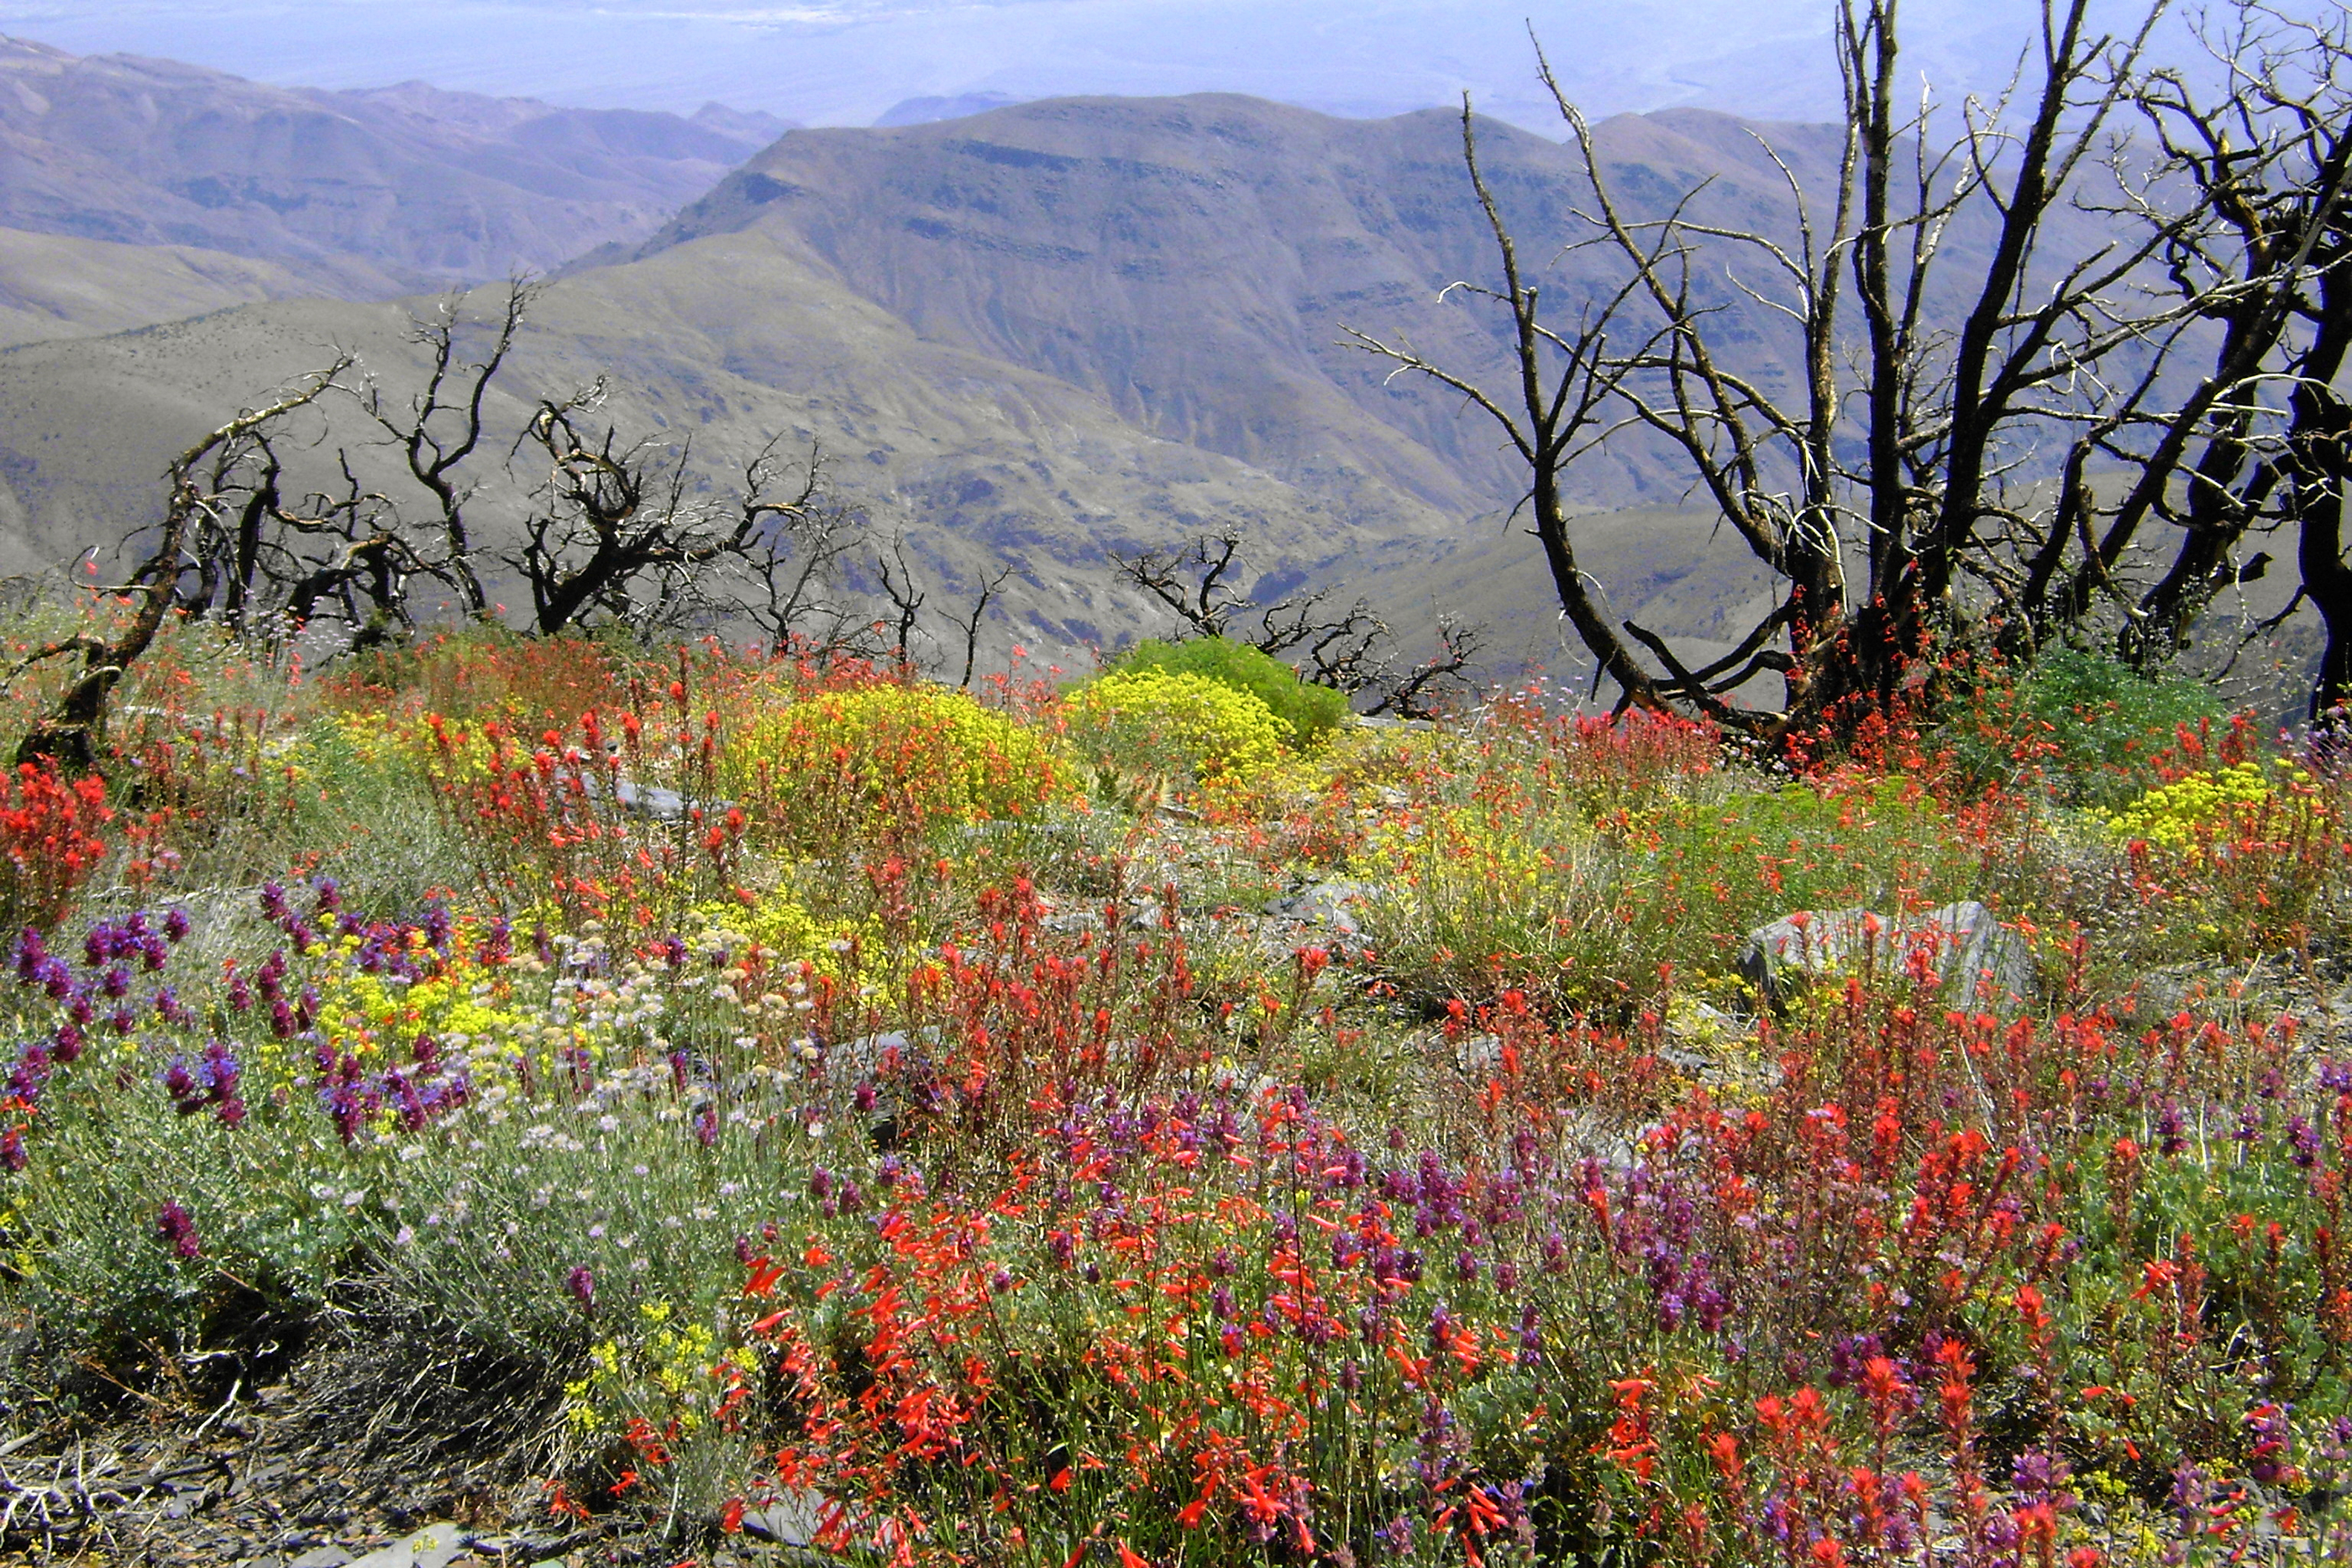 180601-best-national-parks-death-valley-2